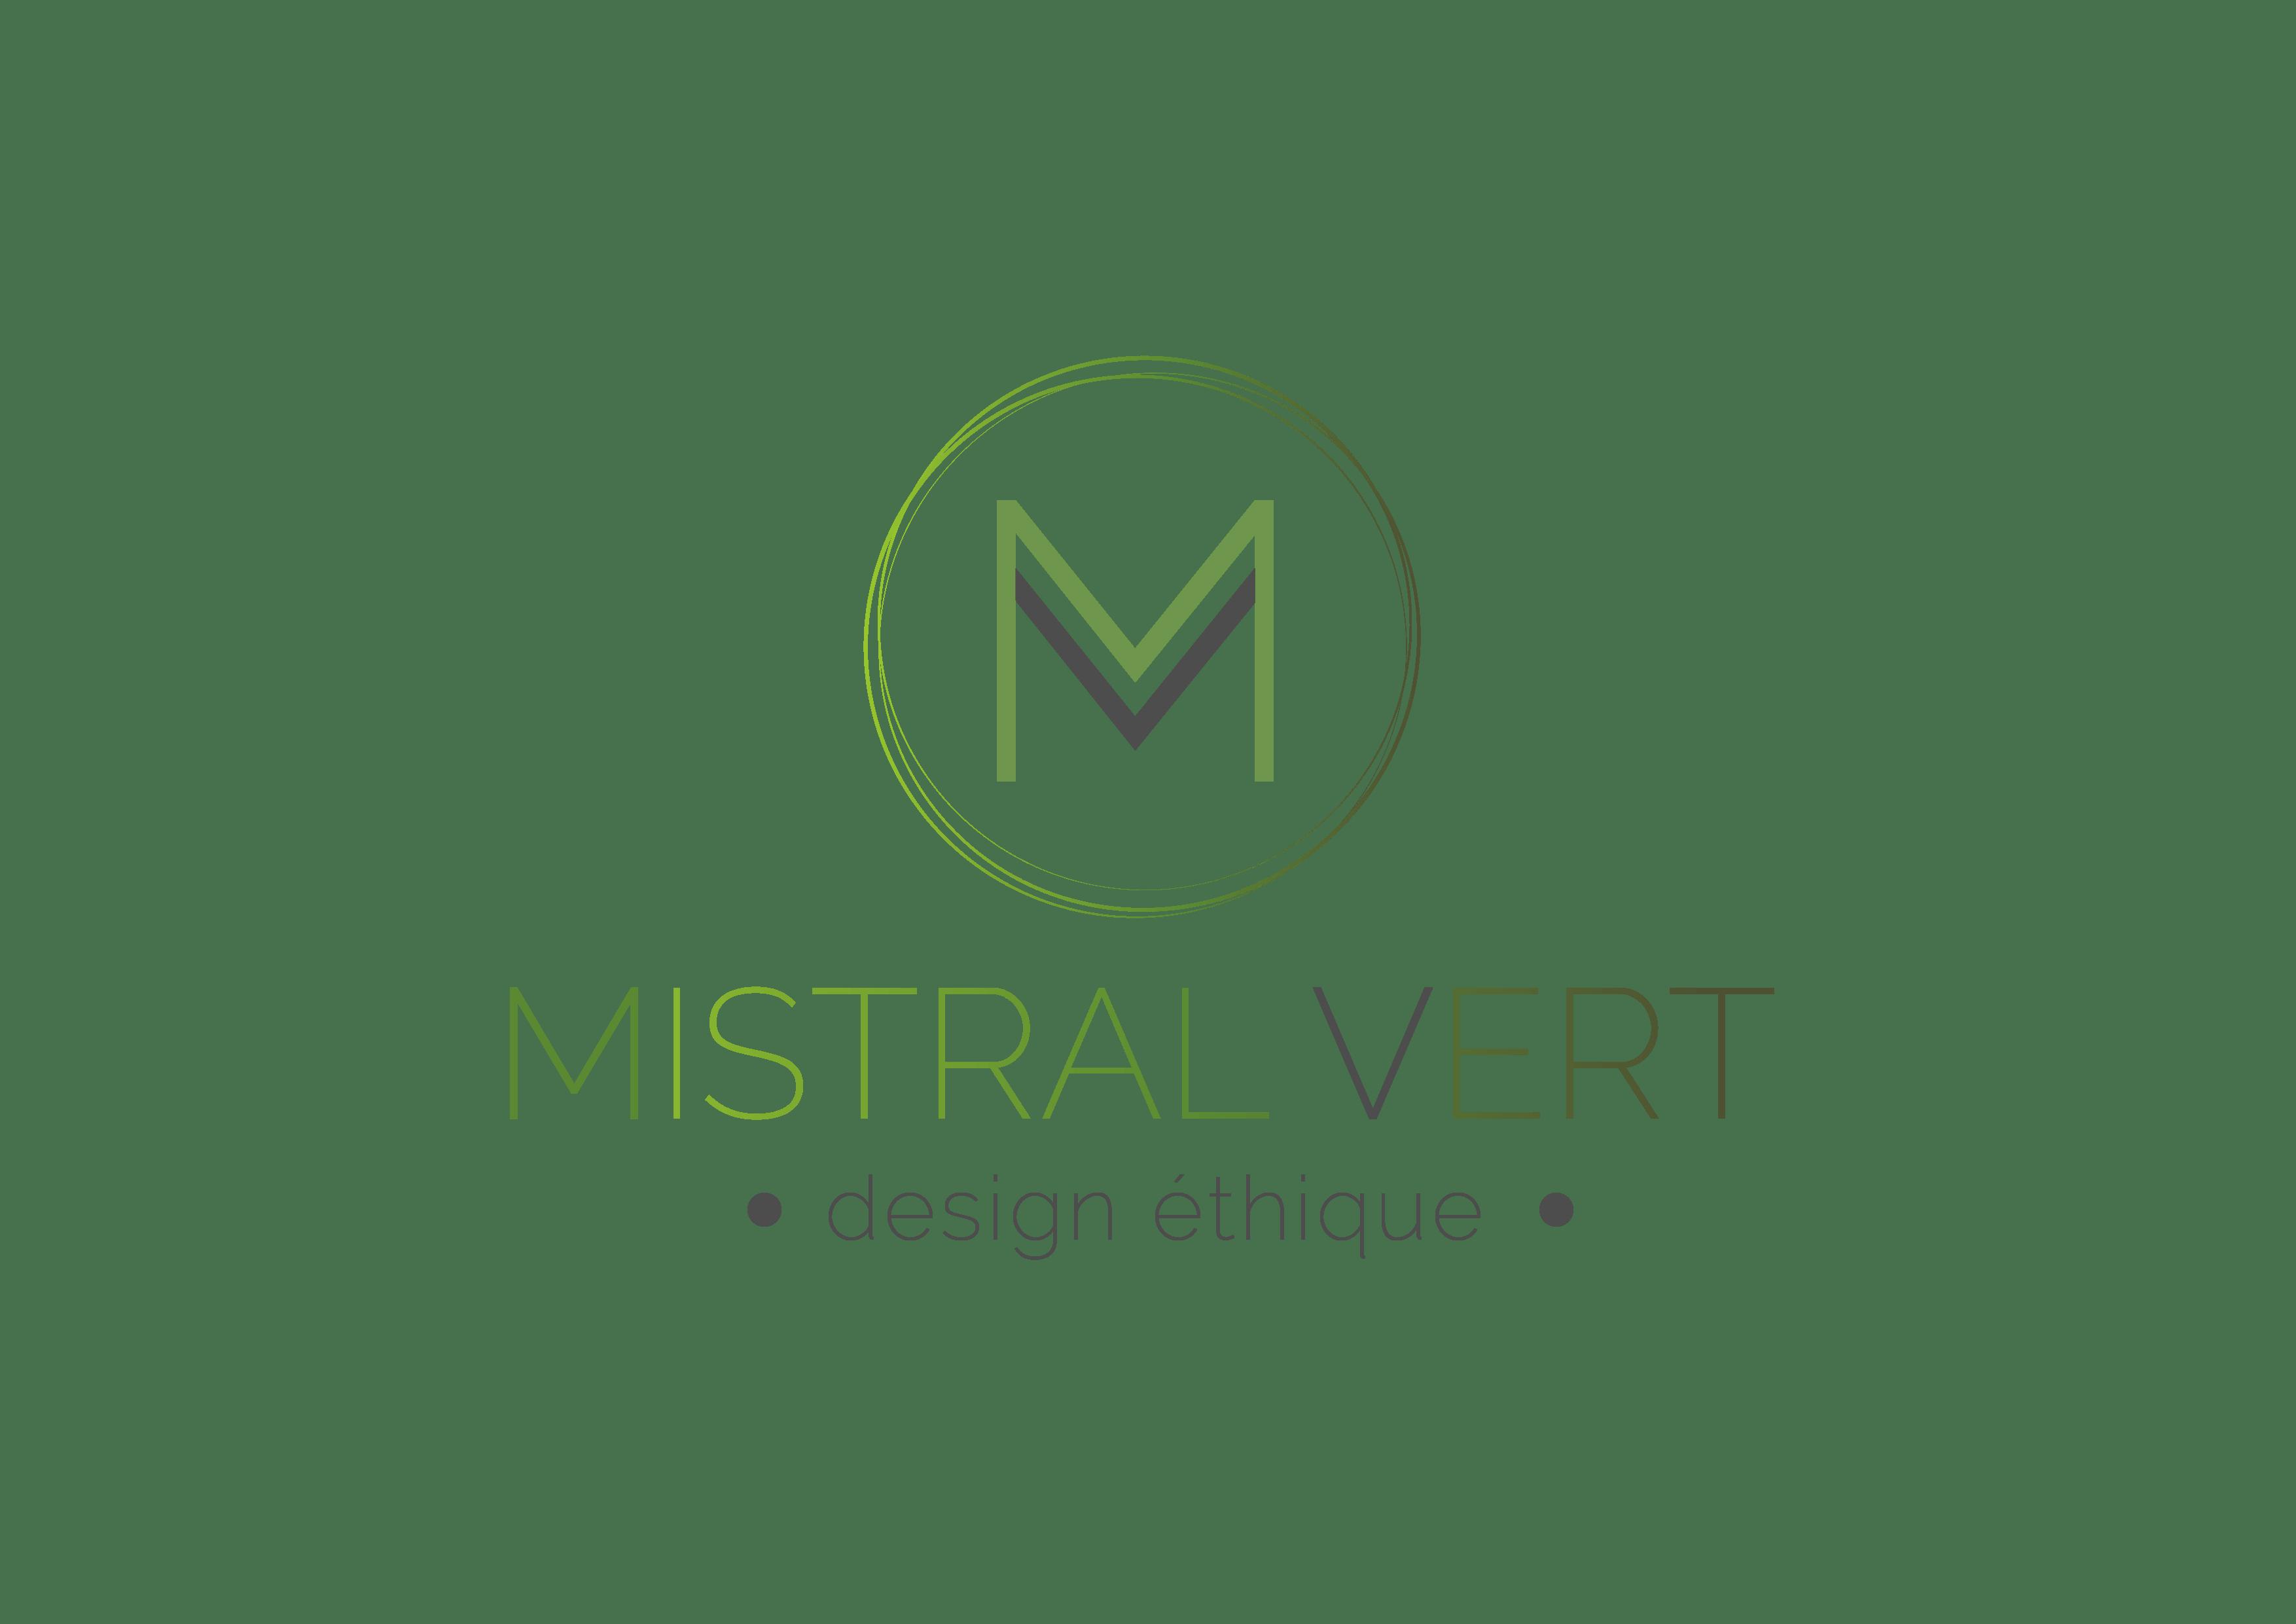 Mistral Vert